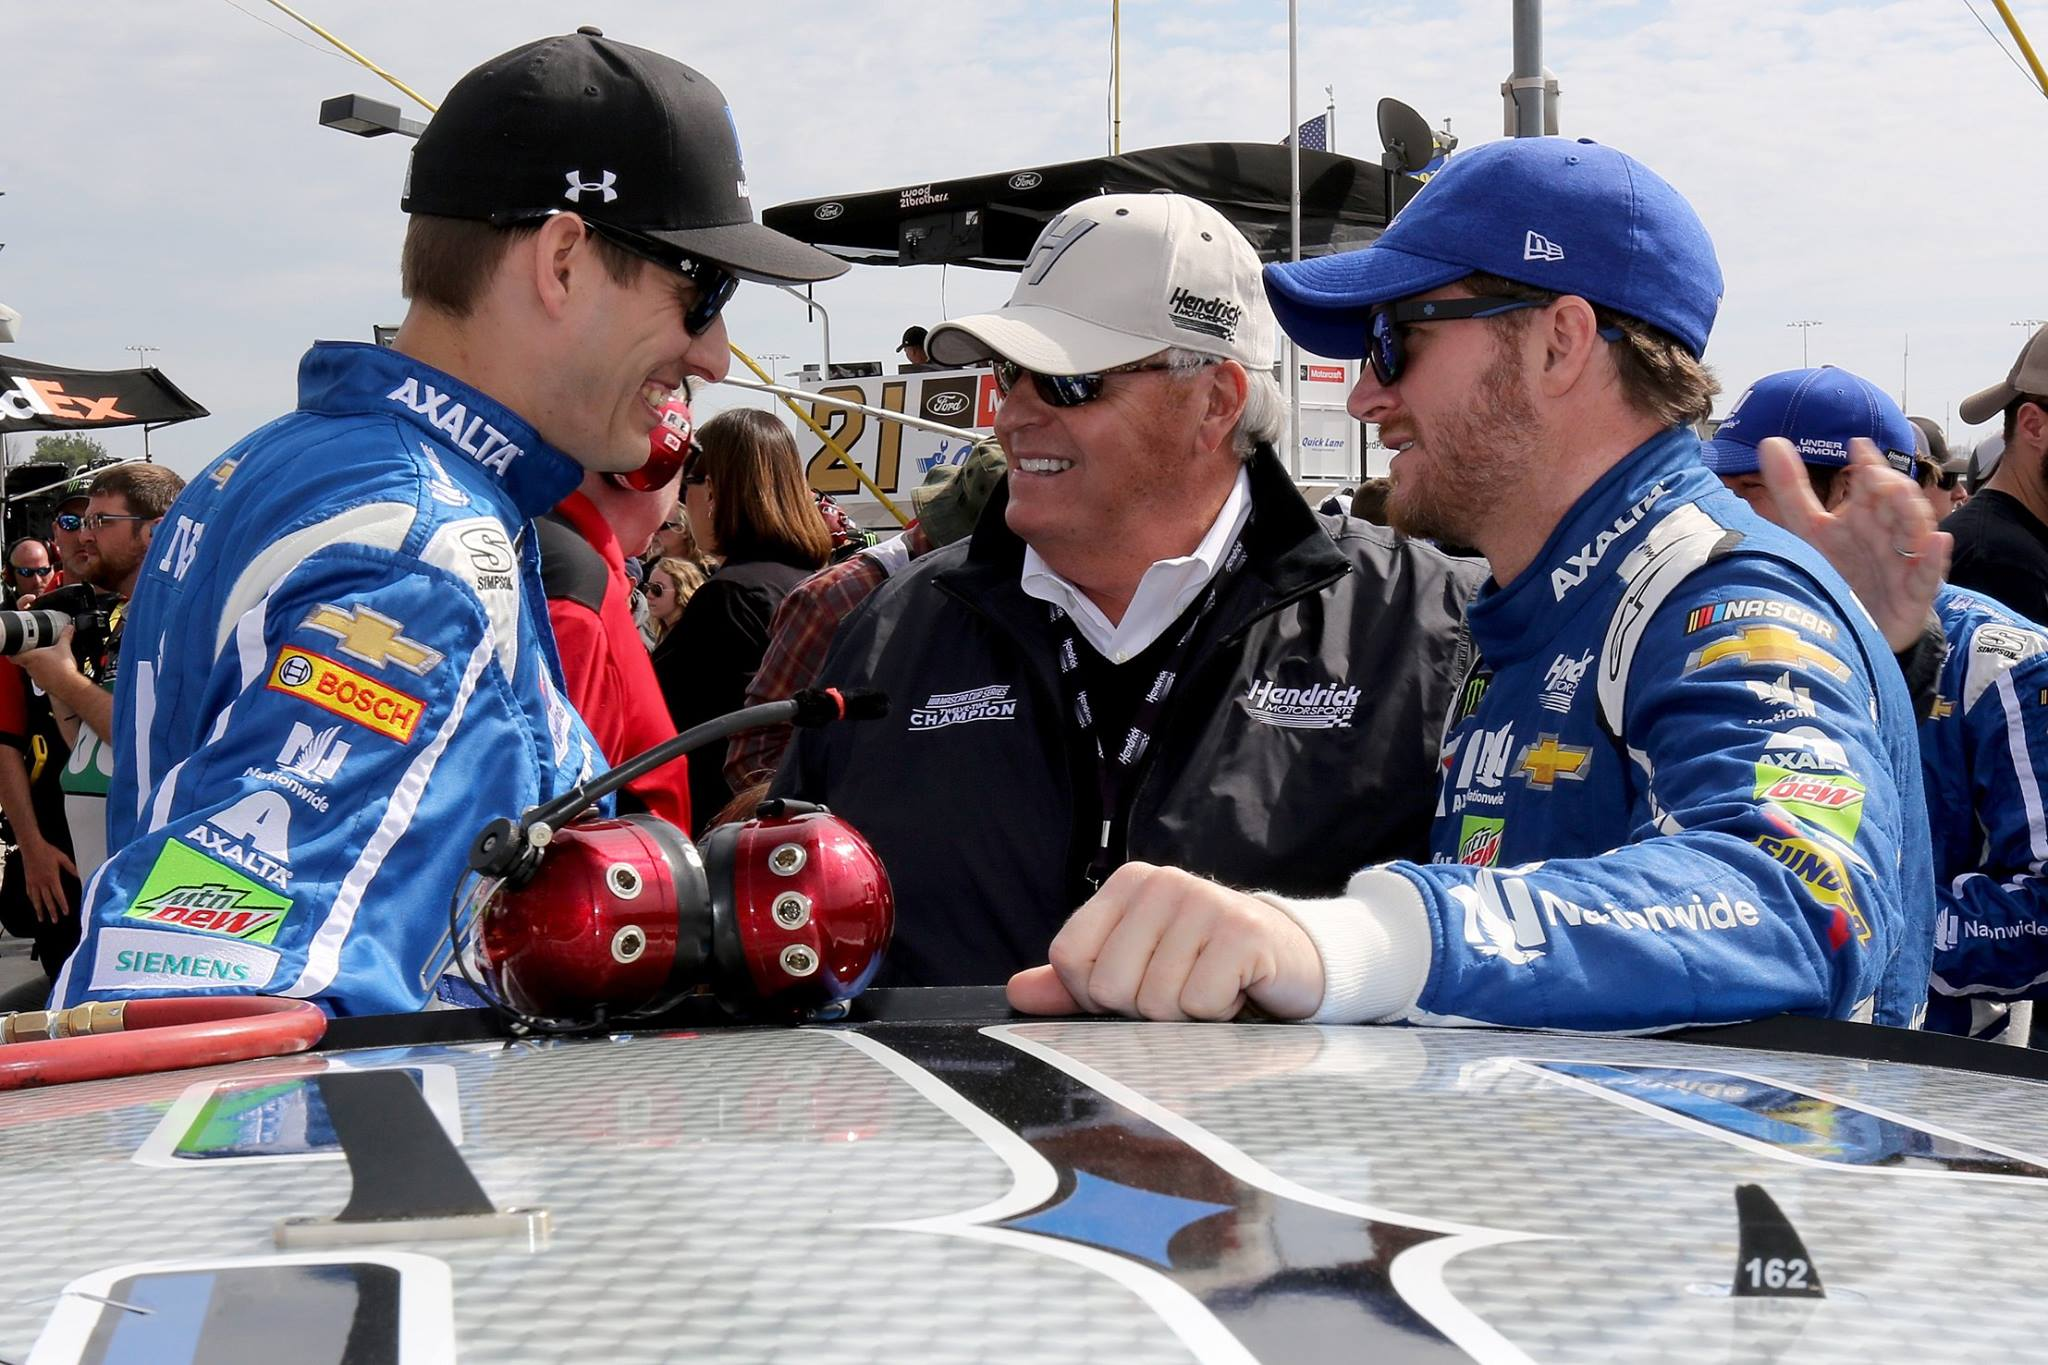 Dale Earnhardt Jr and Rick Hendrick